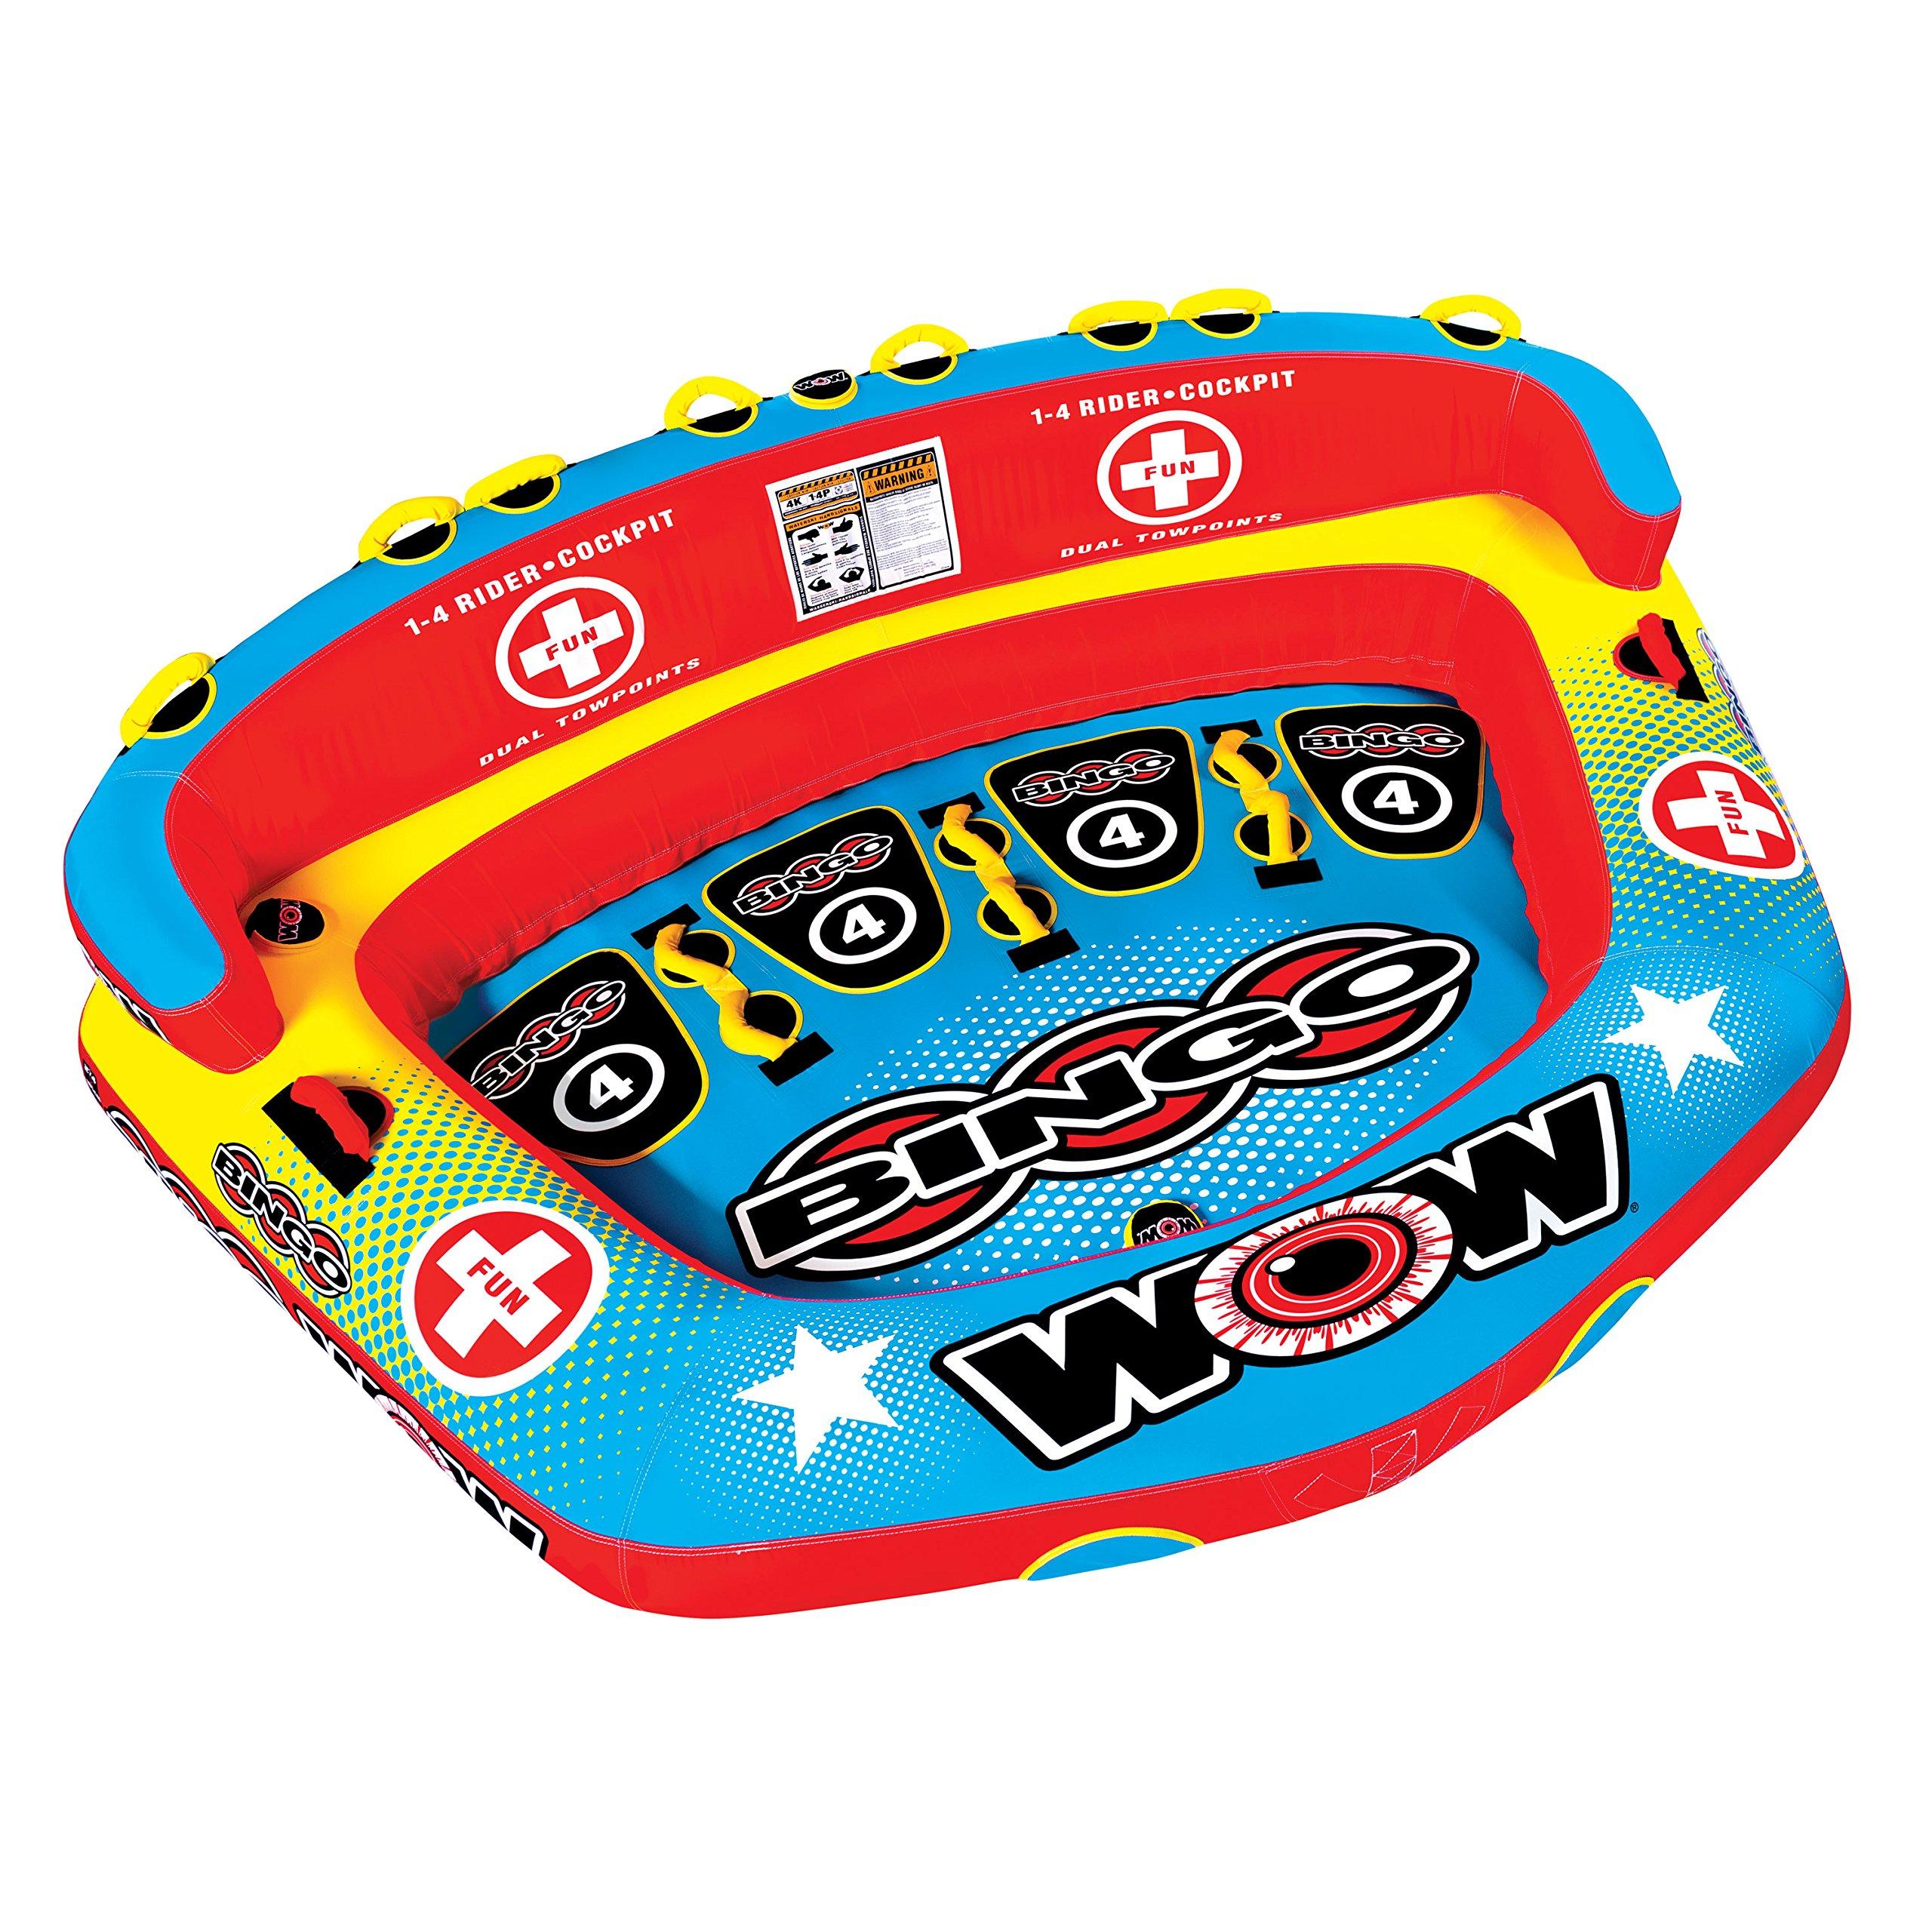 WOW Bingo 4 Rider Towable by WOW